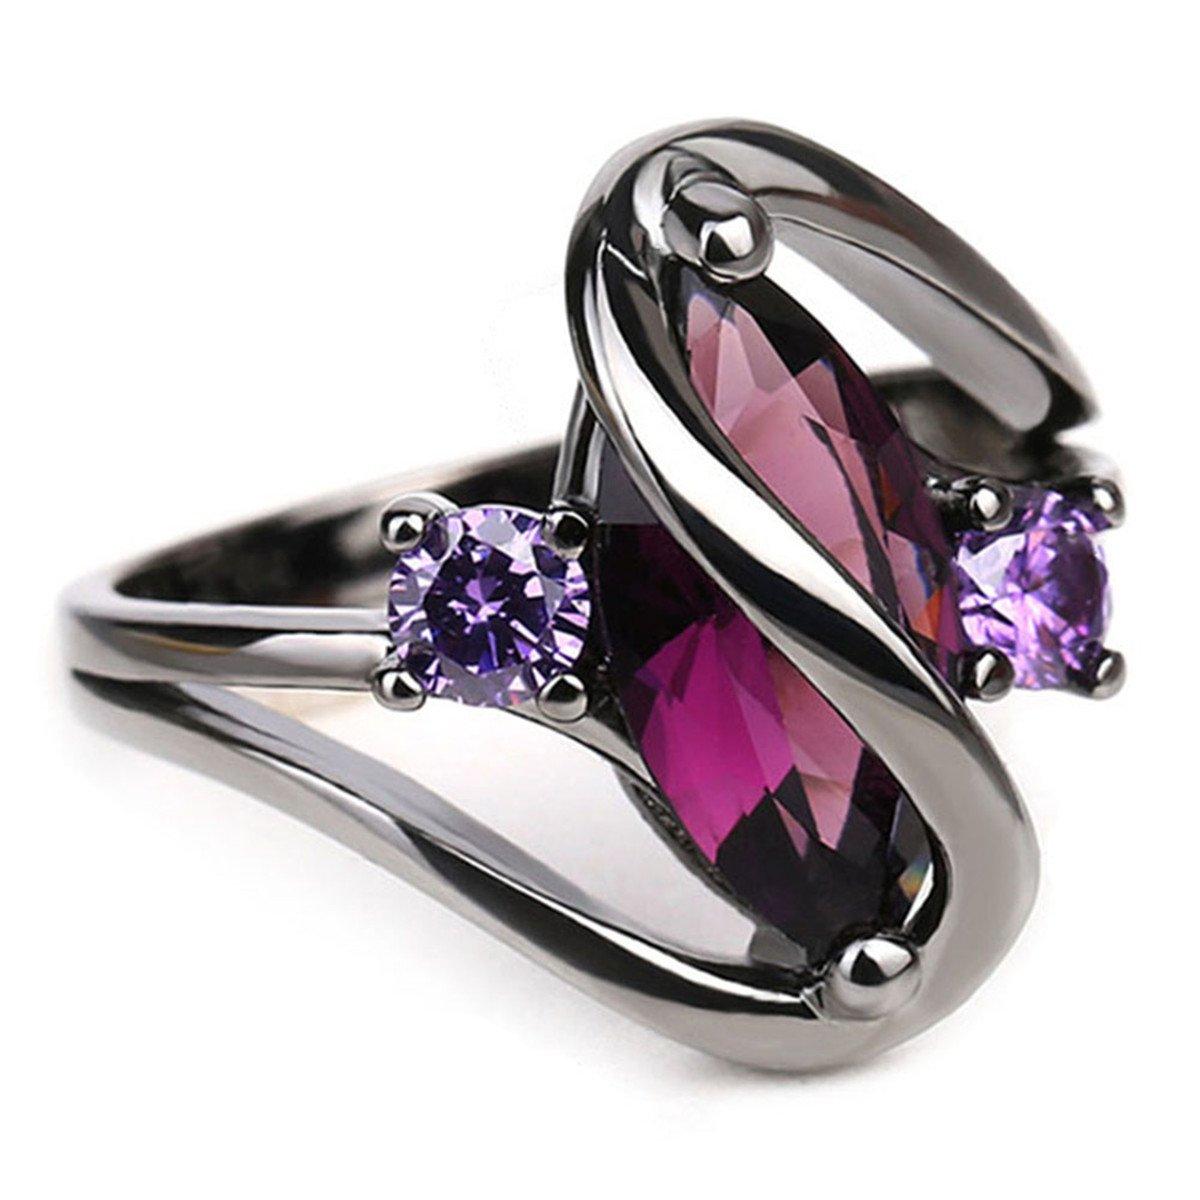 ECYC Trendy Engagement Wedding Rings Women Horse Eye Cz Black Gold Rings